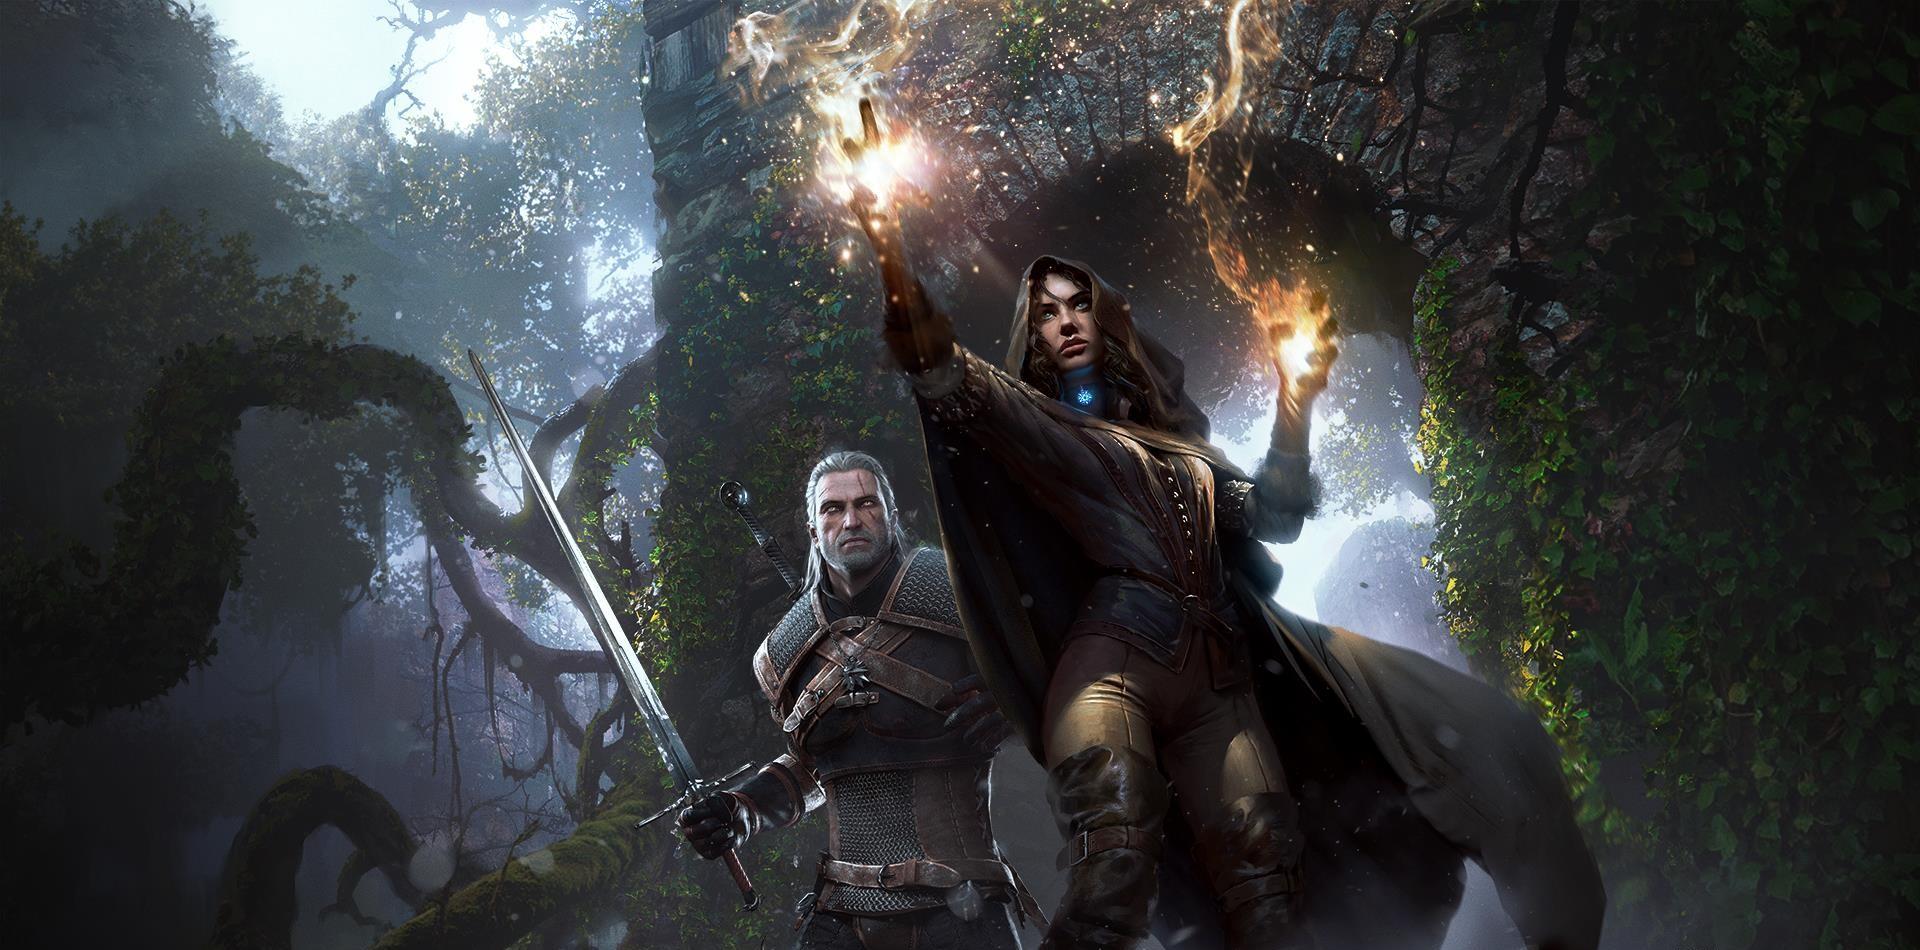 Witcher 3: Wild Hunt - Witcher 3: Wild Hunt, the Арт